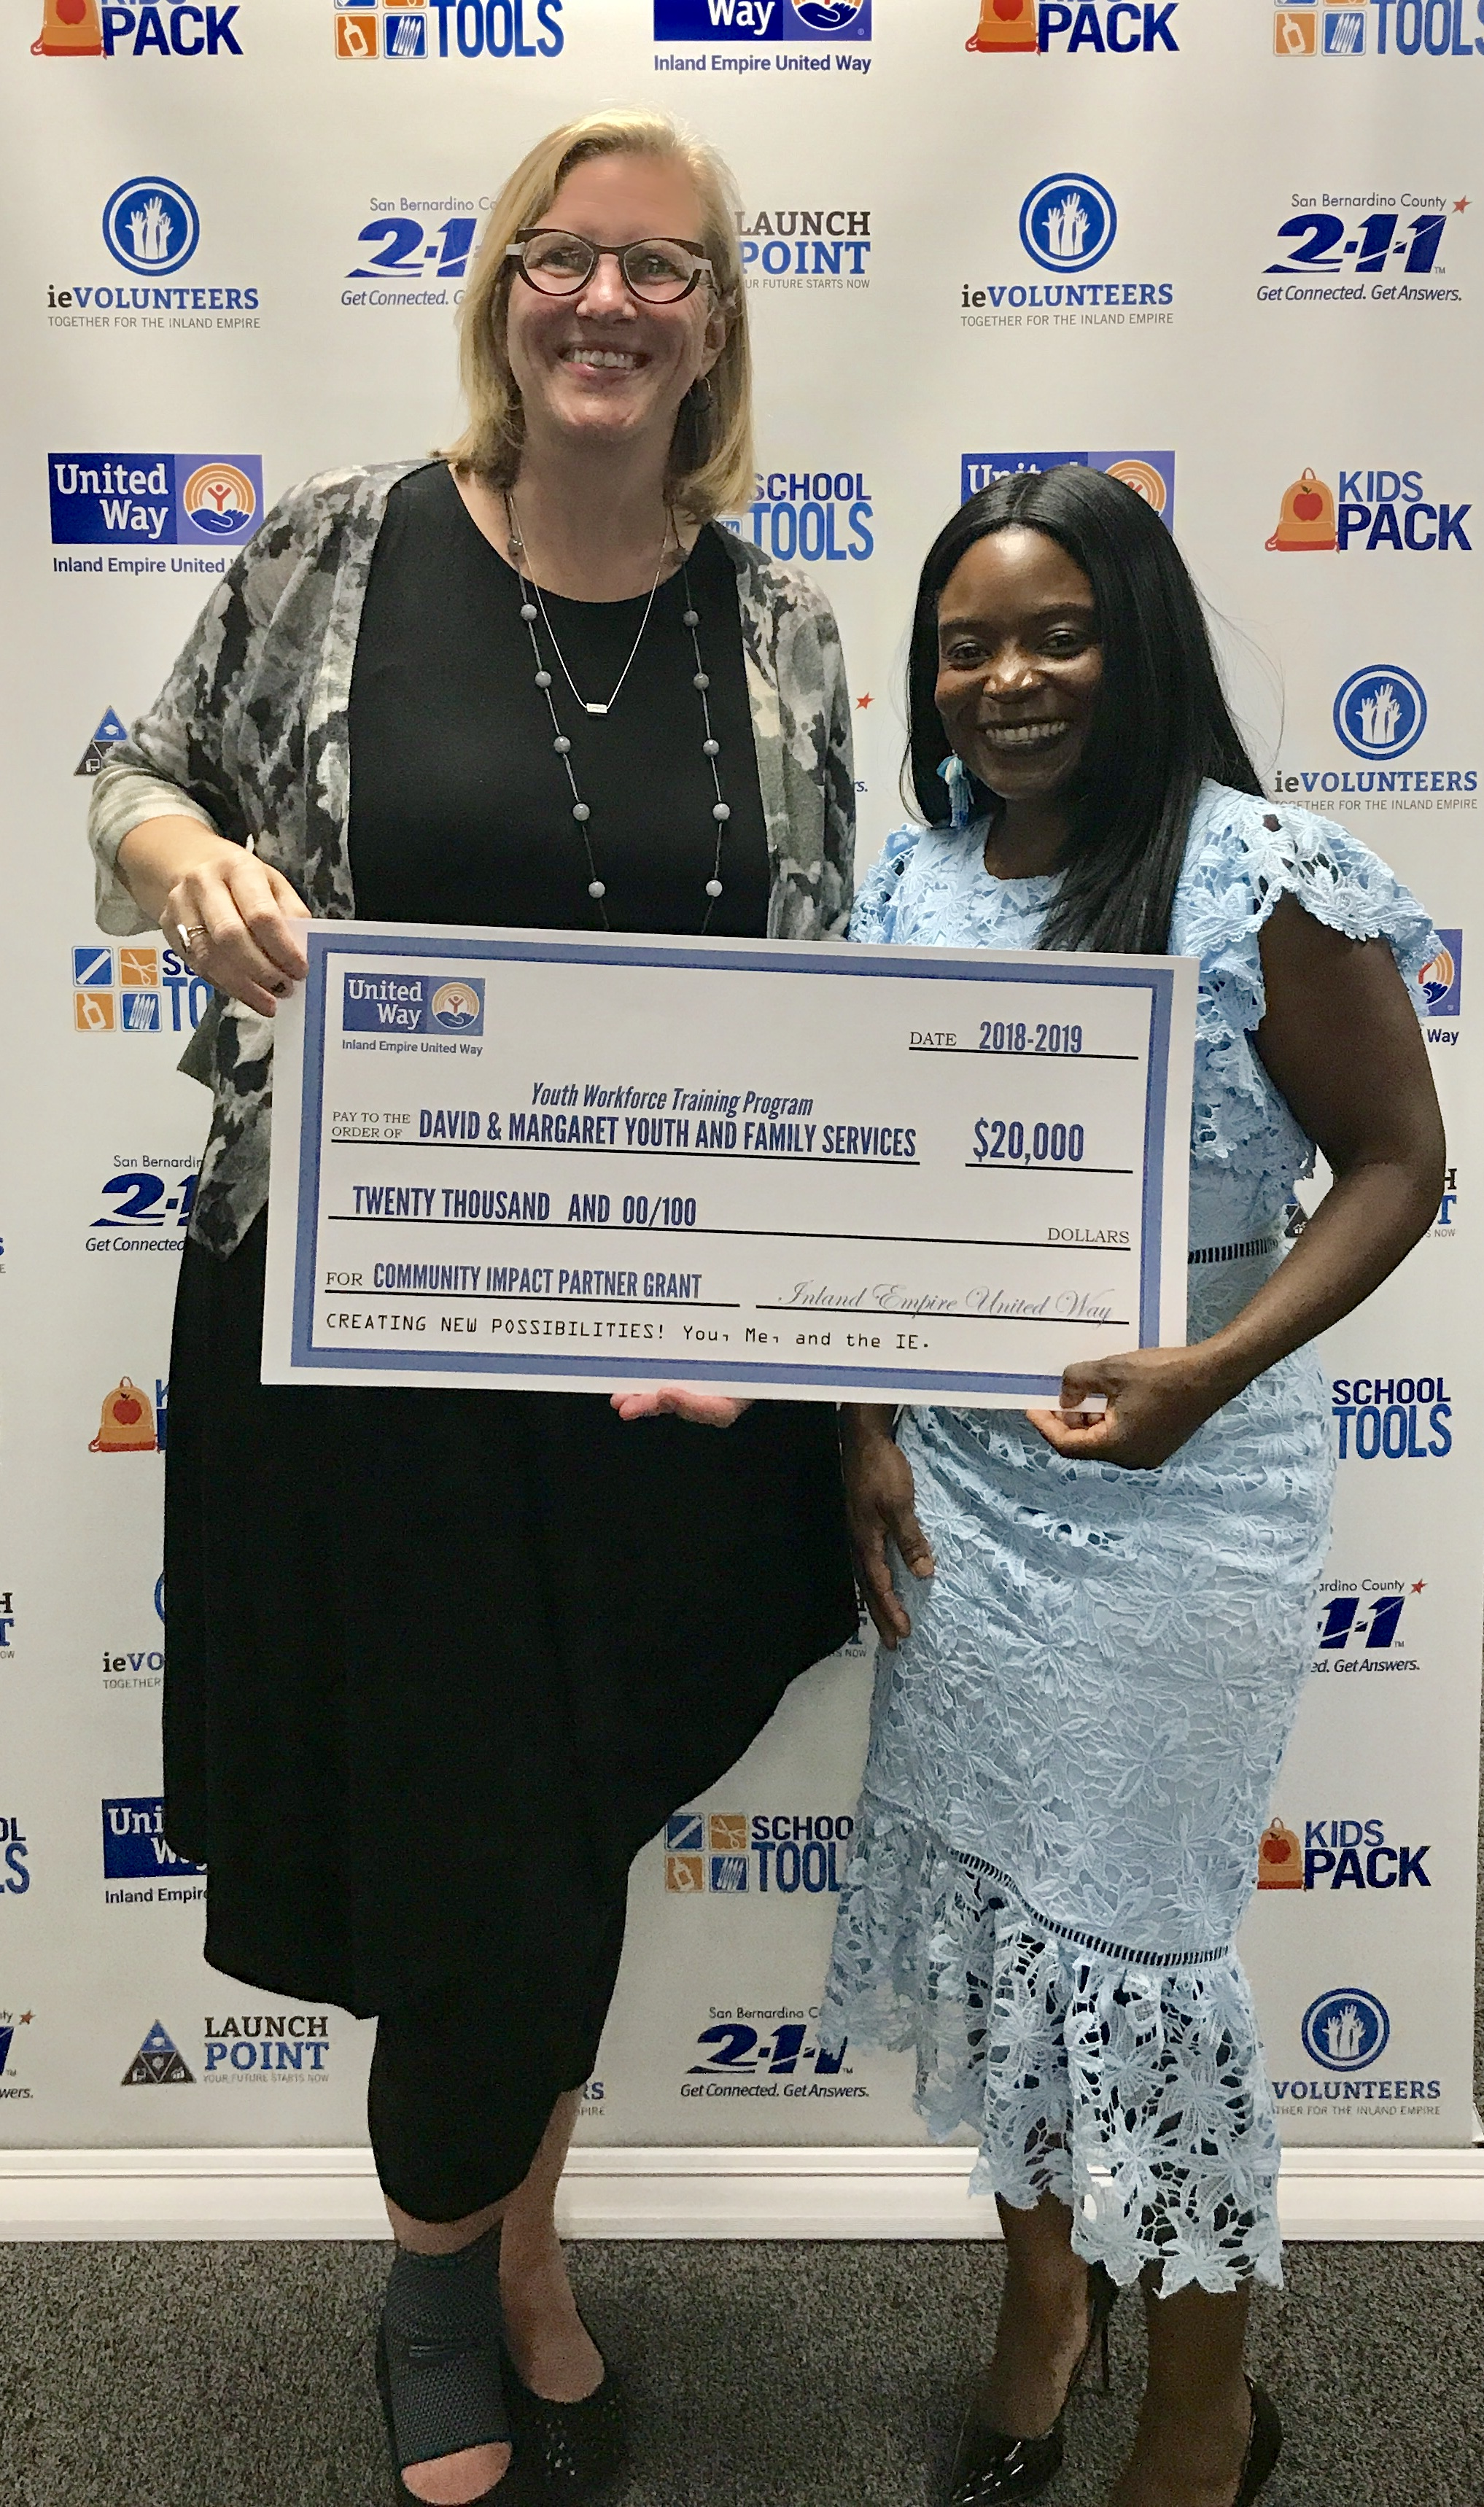 David & Margaret Receives Inland Empire United Way $20,000 Grant